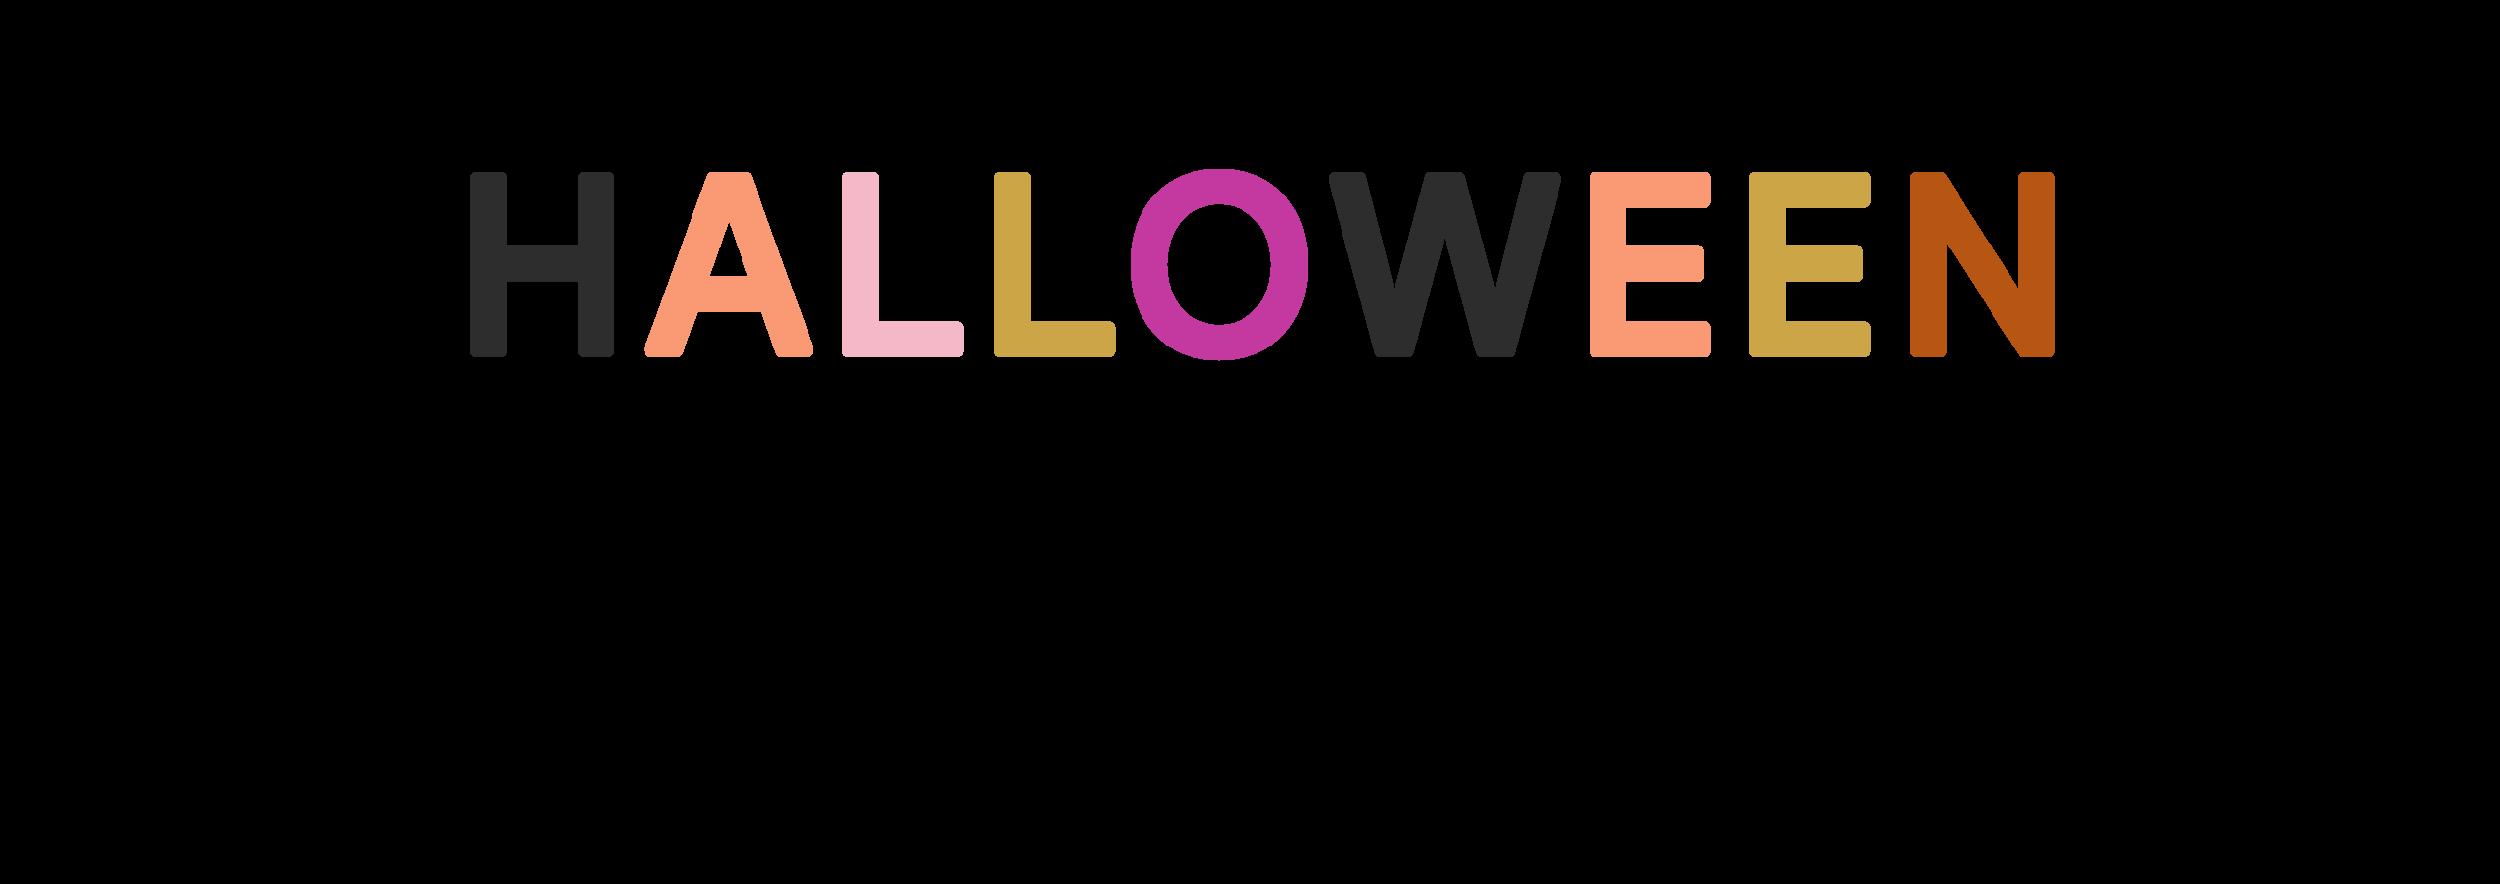 costumes halloween.png